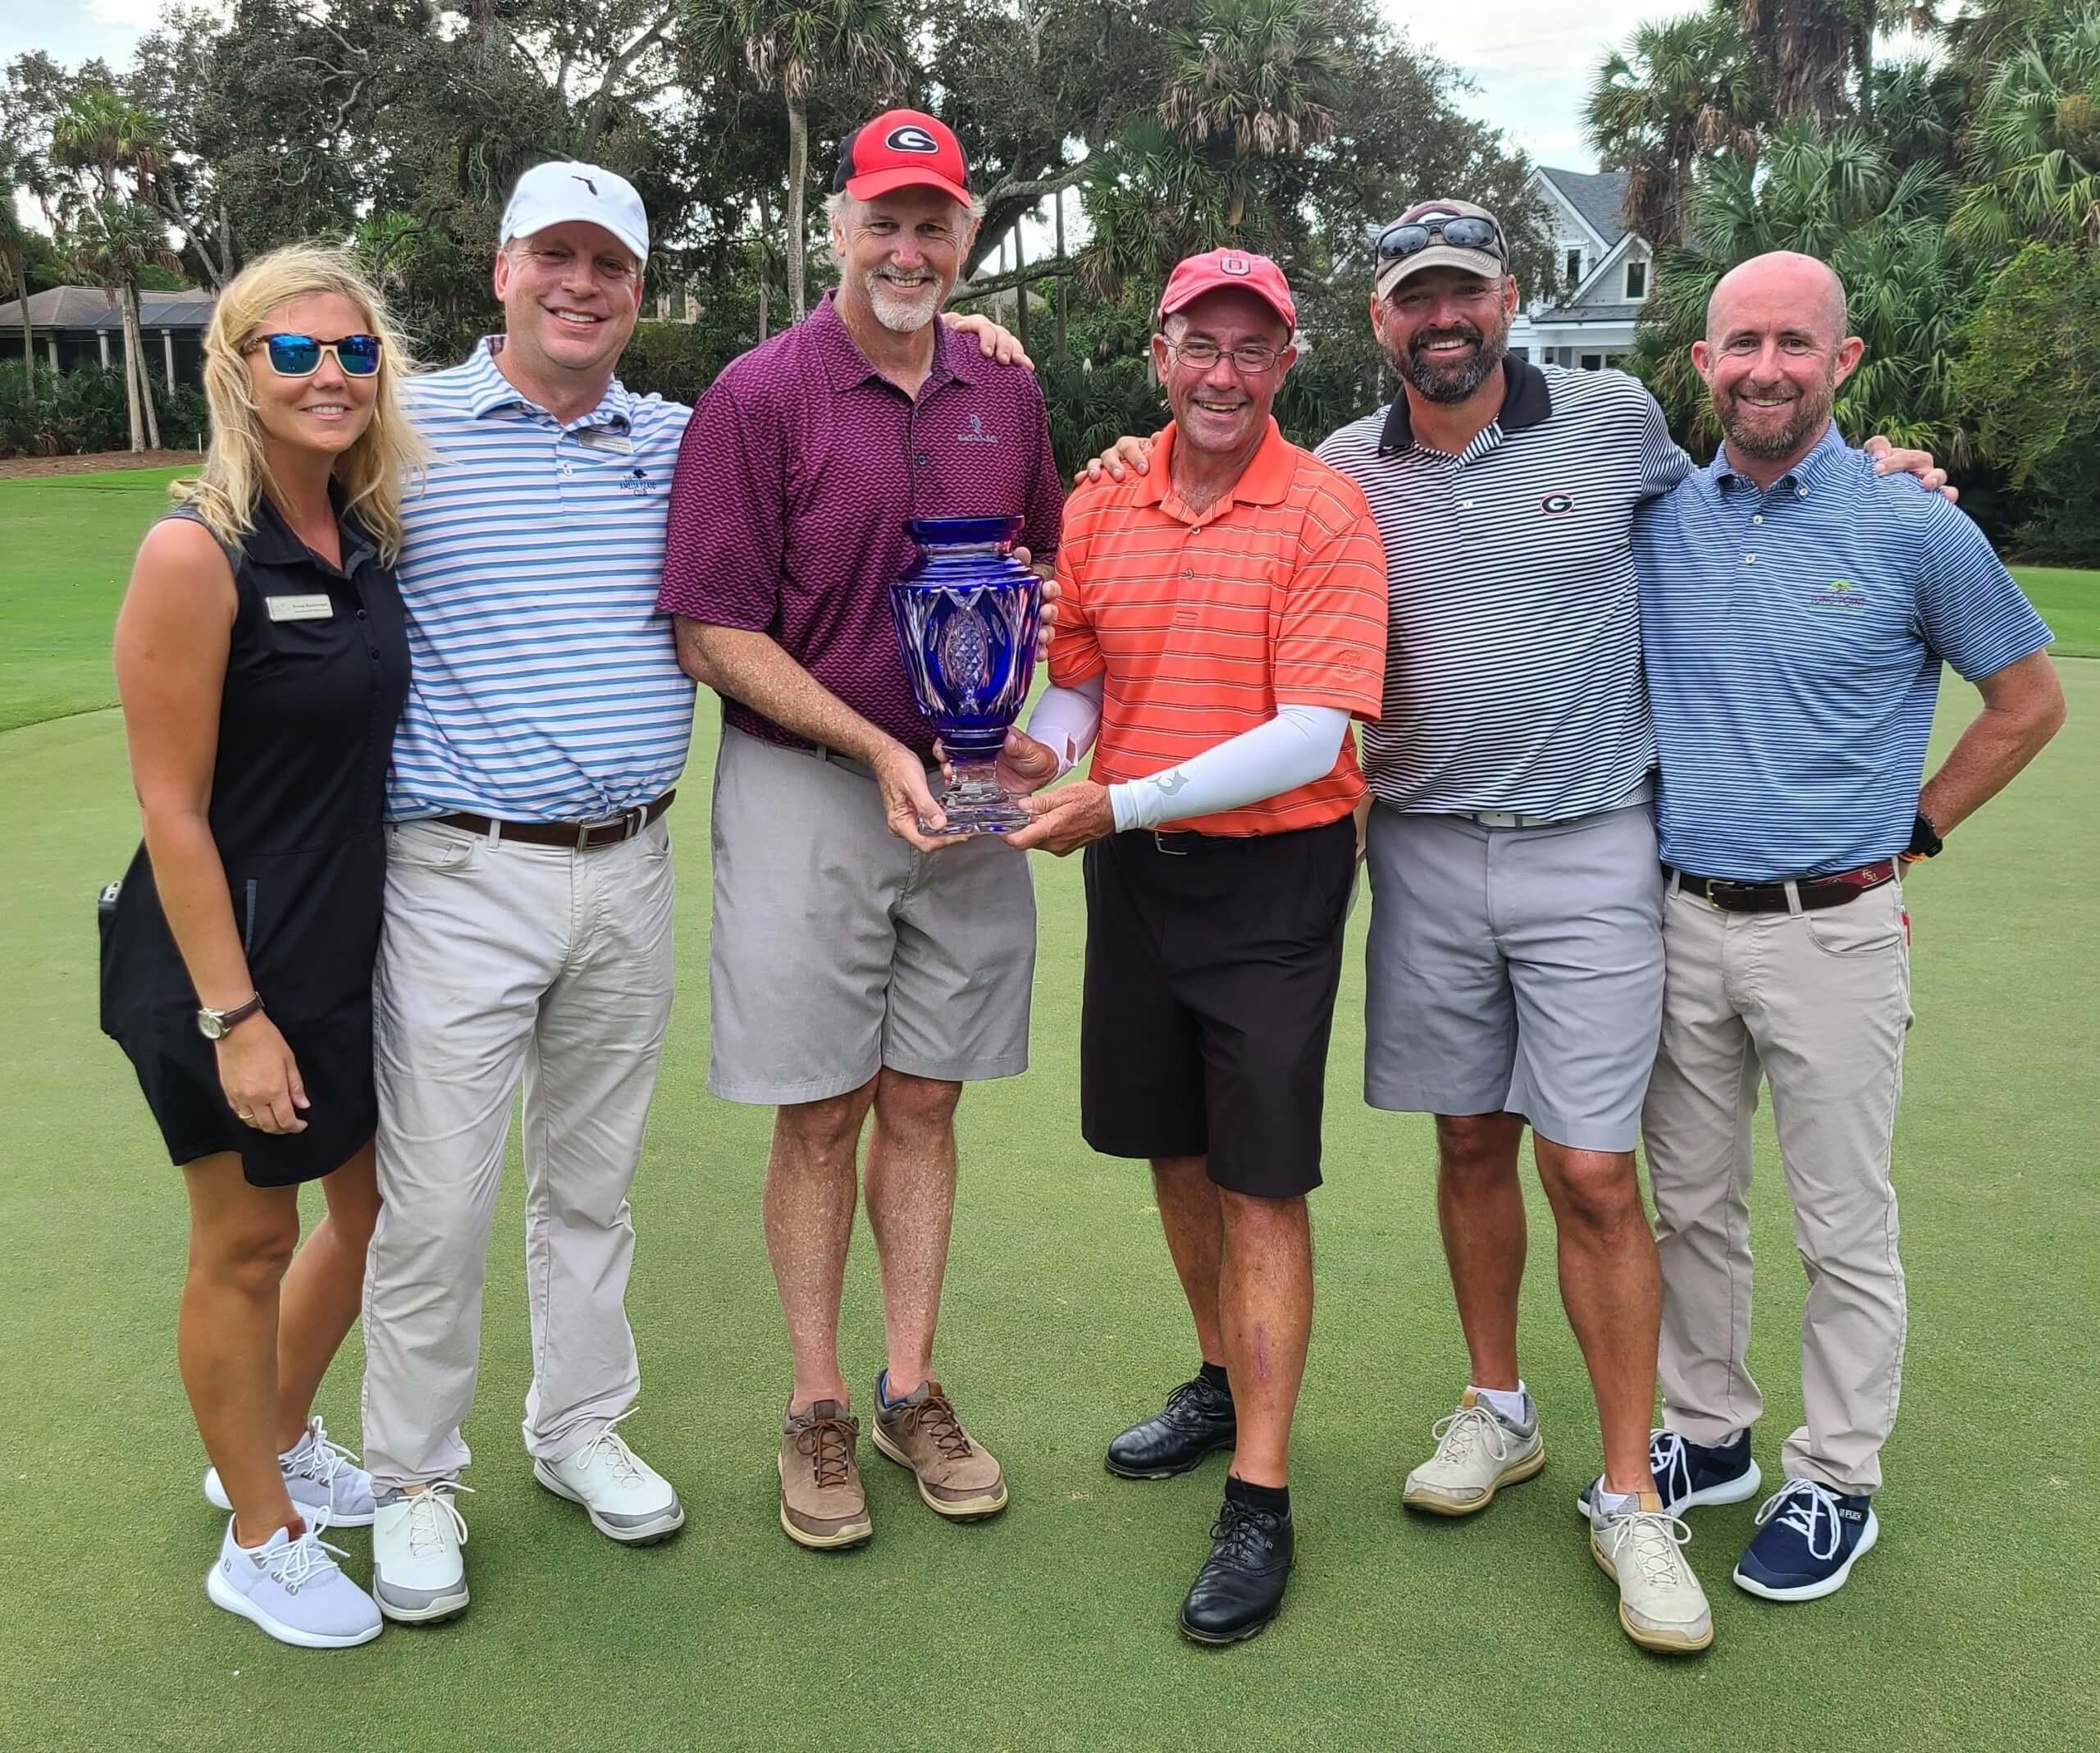 2020 Men's Member Member winners receiving the Mike Joyce Trophy